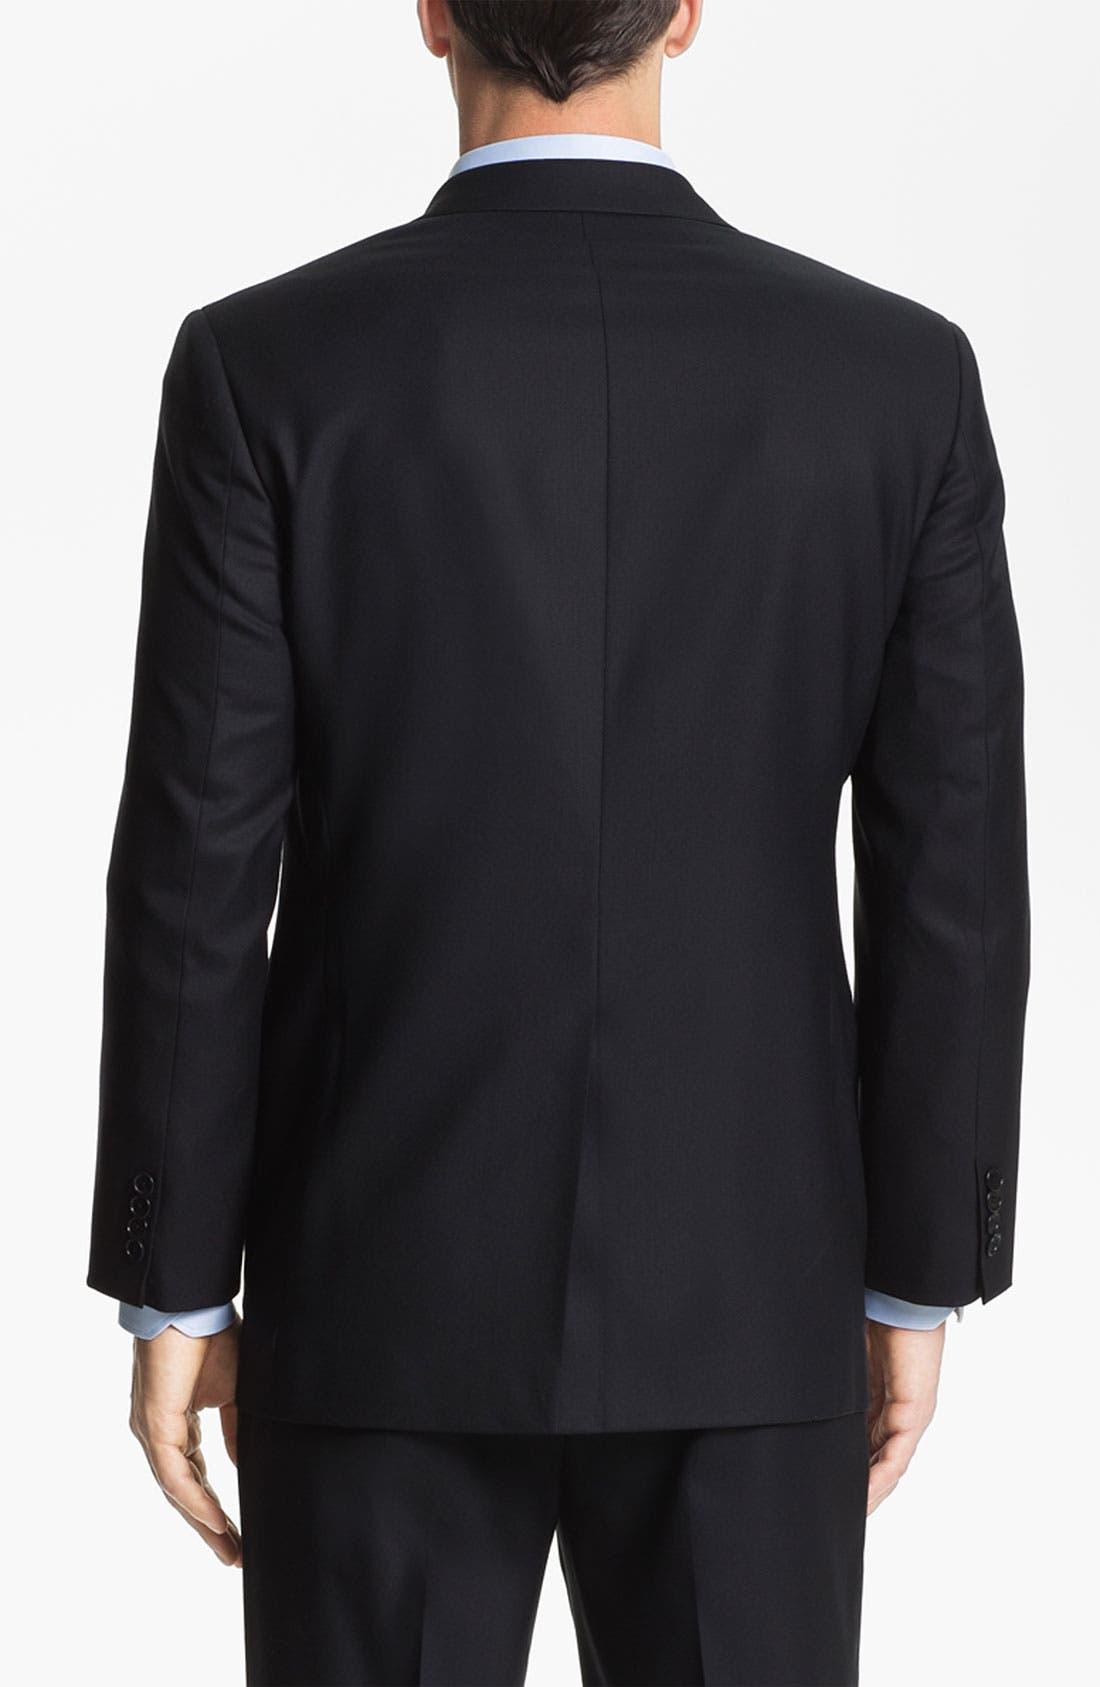 'Madison' Wool Suit,                             Alternate thumbnail 2, color,                             410